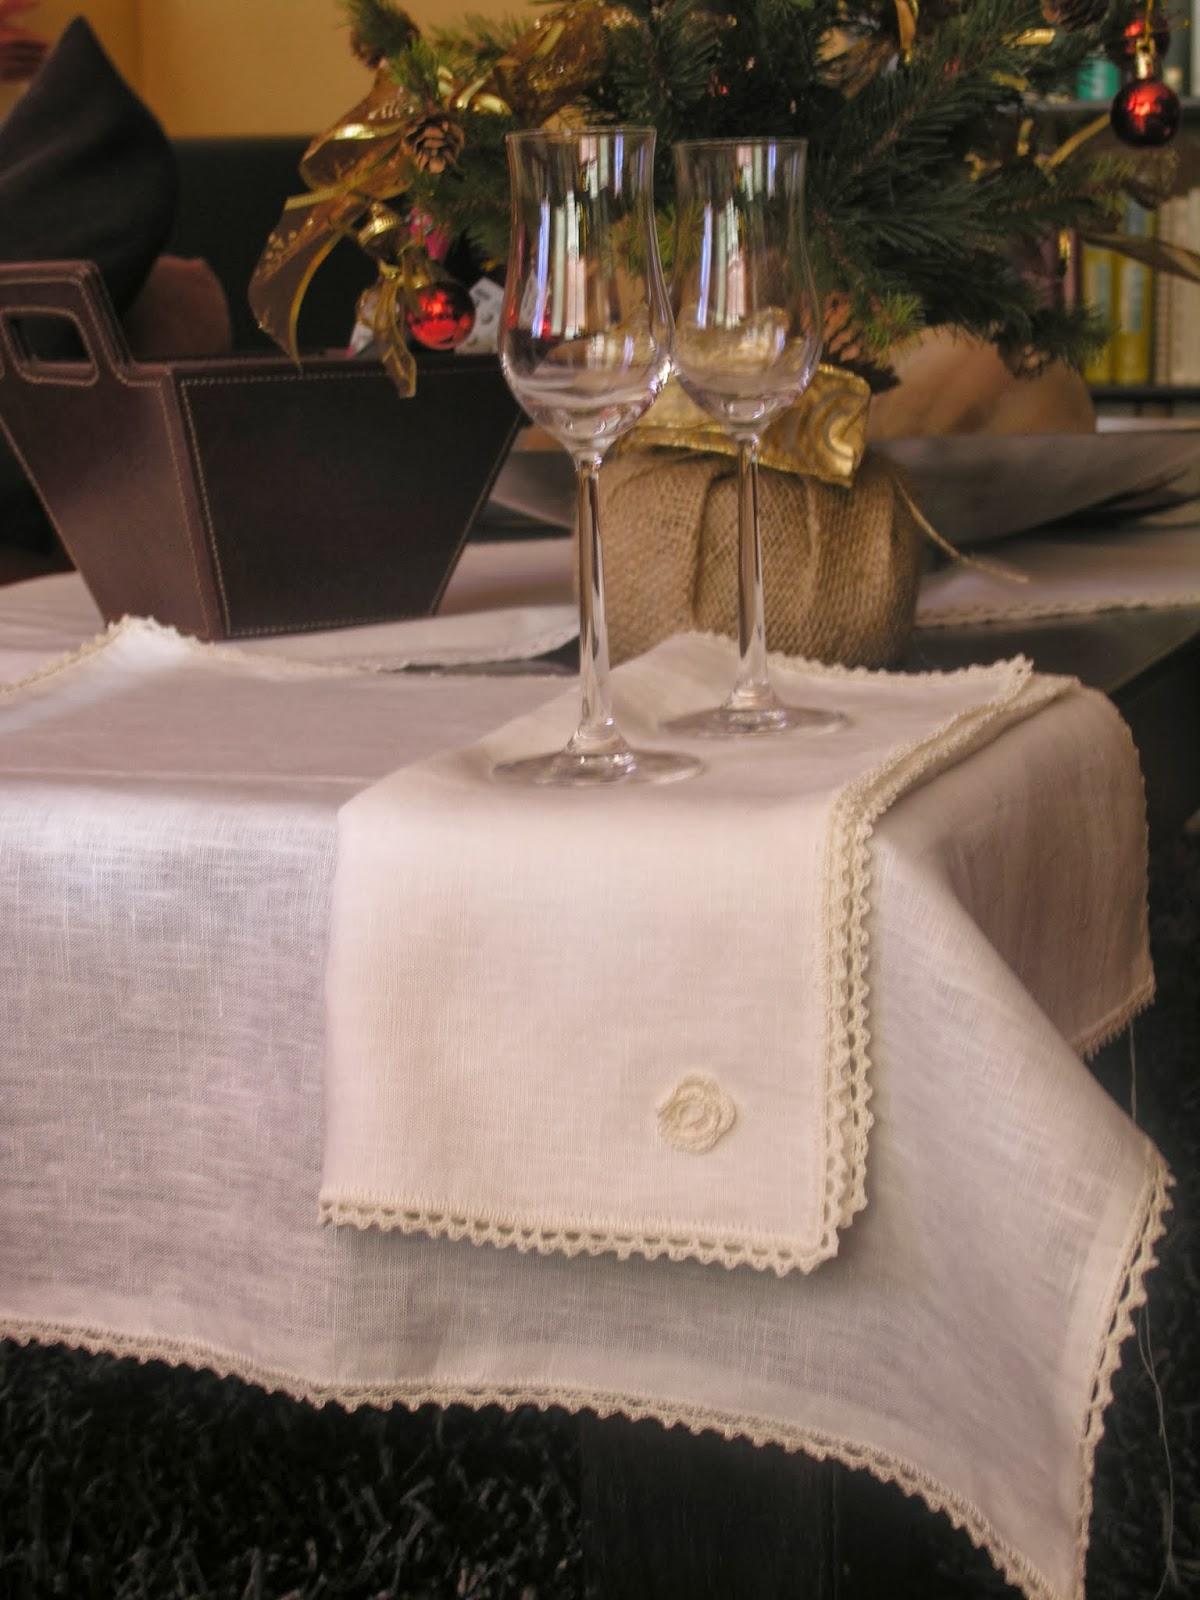 Crochet handmade manteles de lino y crochet handmade - Manteles de lino ...